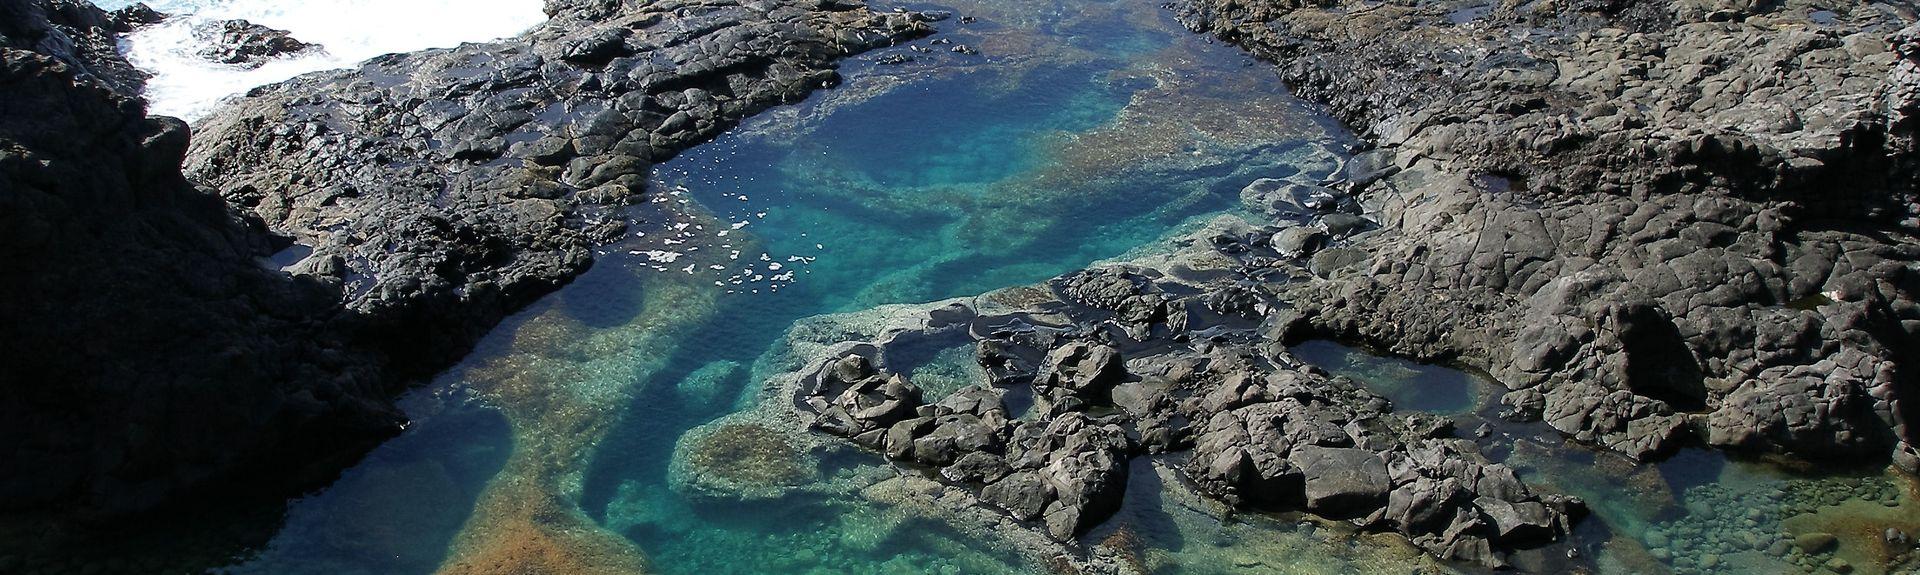 Güime, Lanzarote, Spain